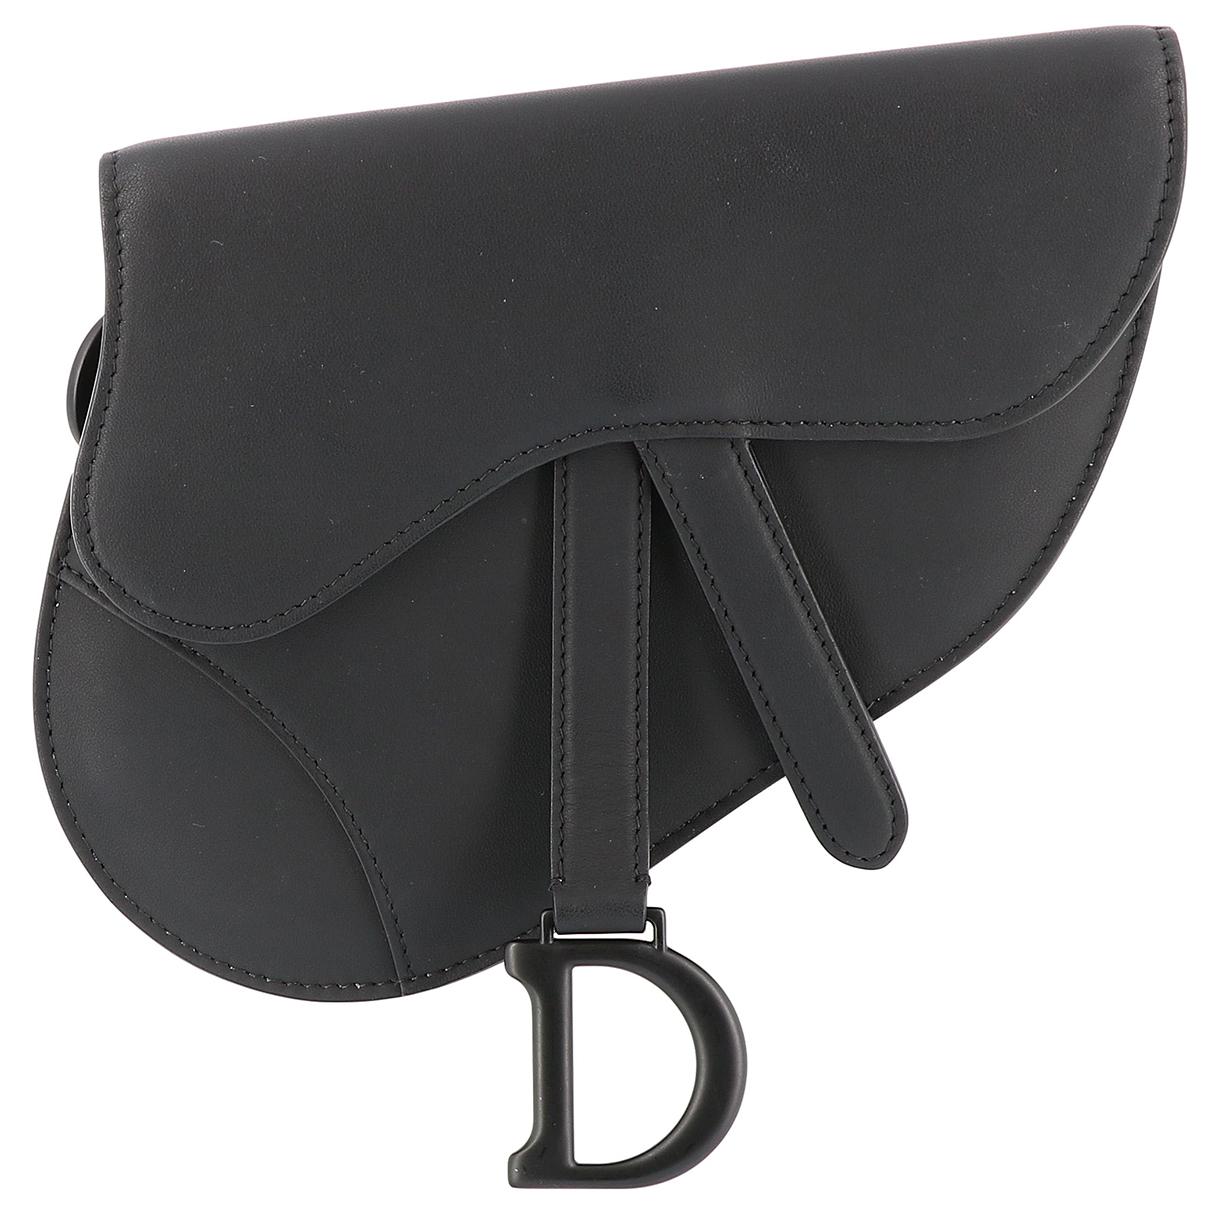 Dior Saddle Clutch in  Schwarz Leder